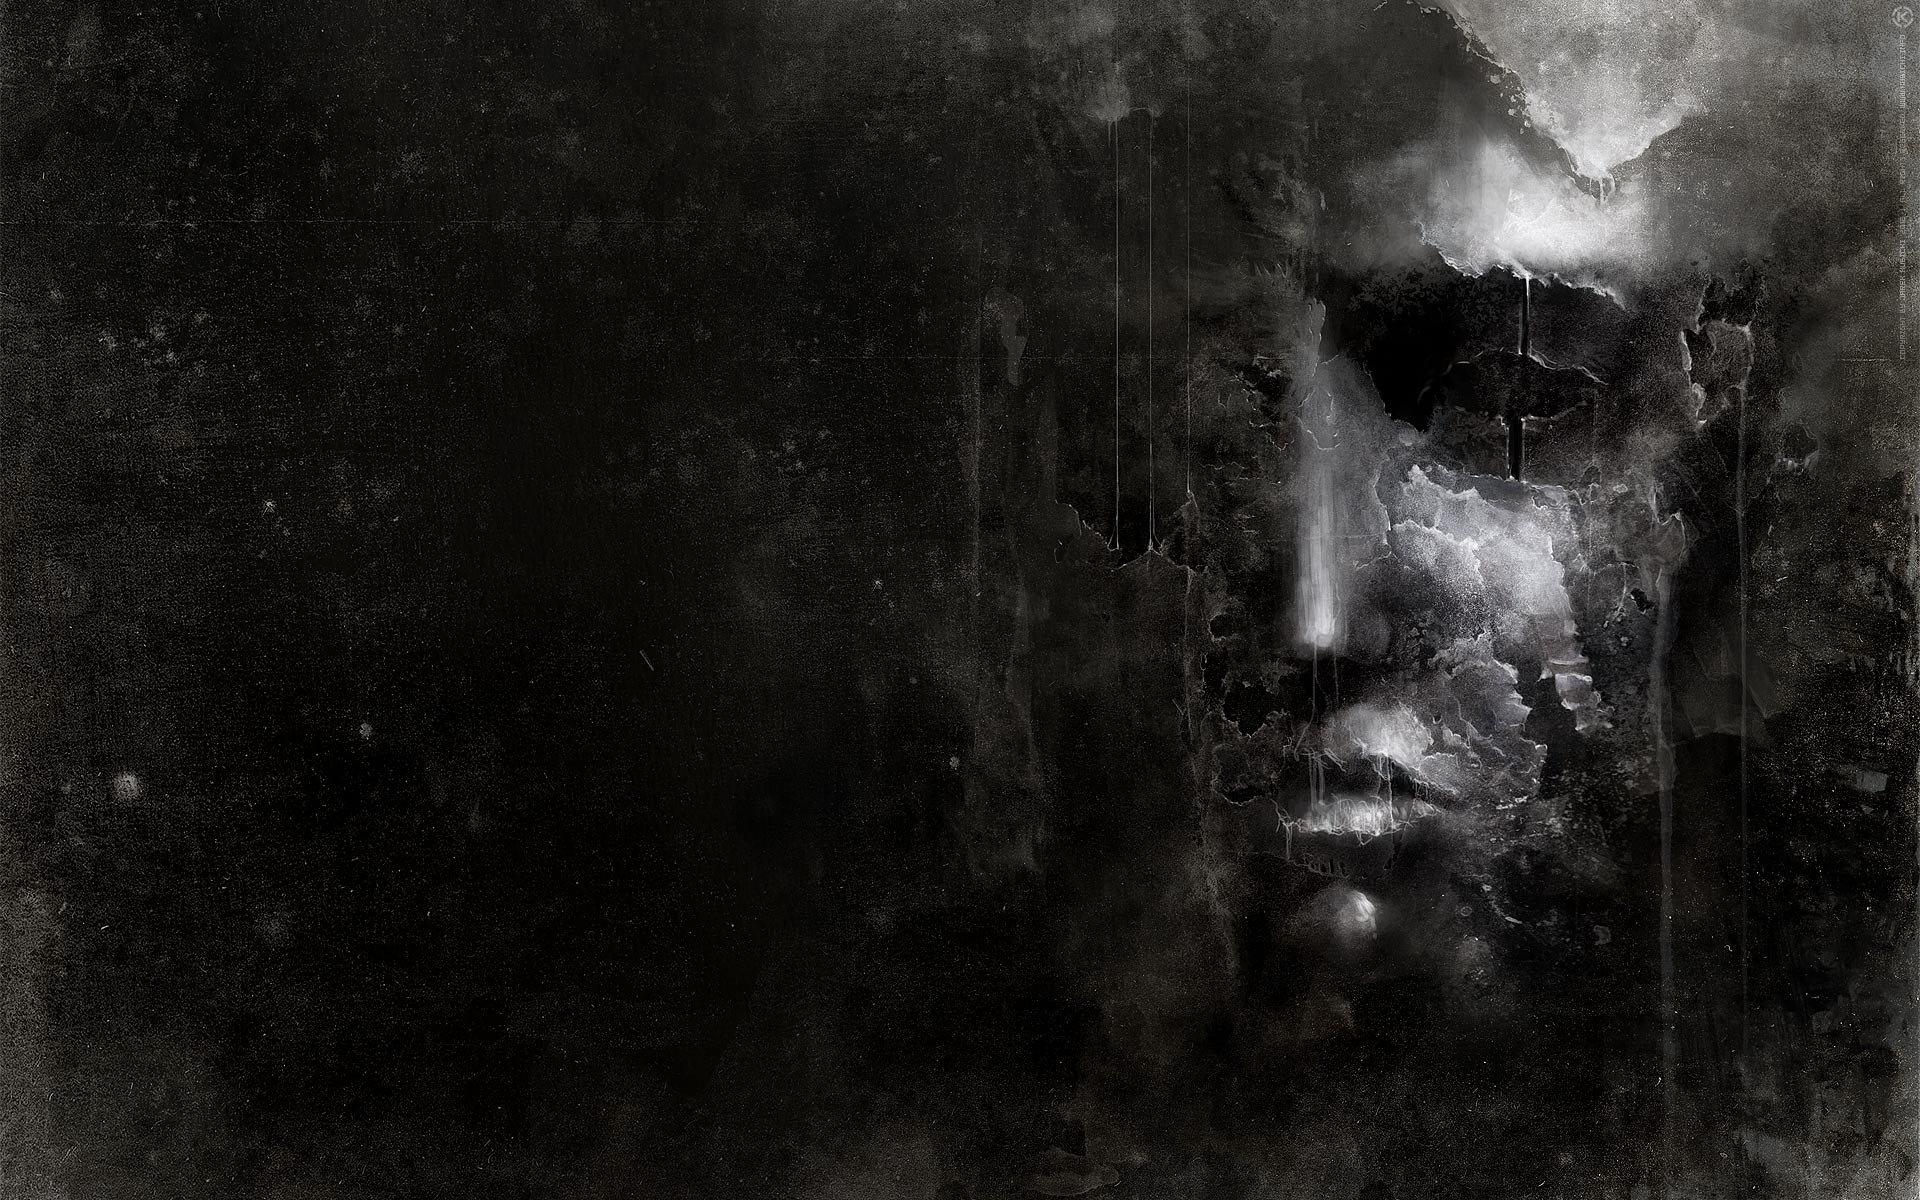 Wallpaper 1920x1200 Px Dark Face Gothic Sad Sorrow